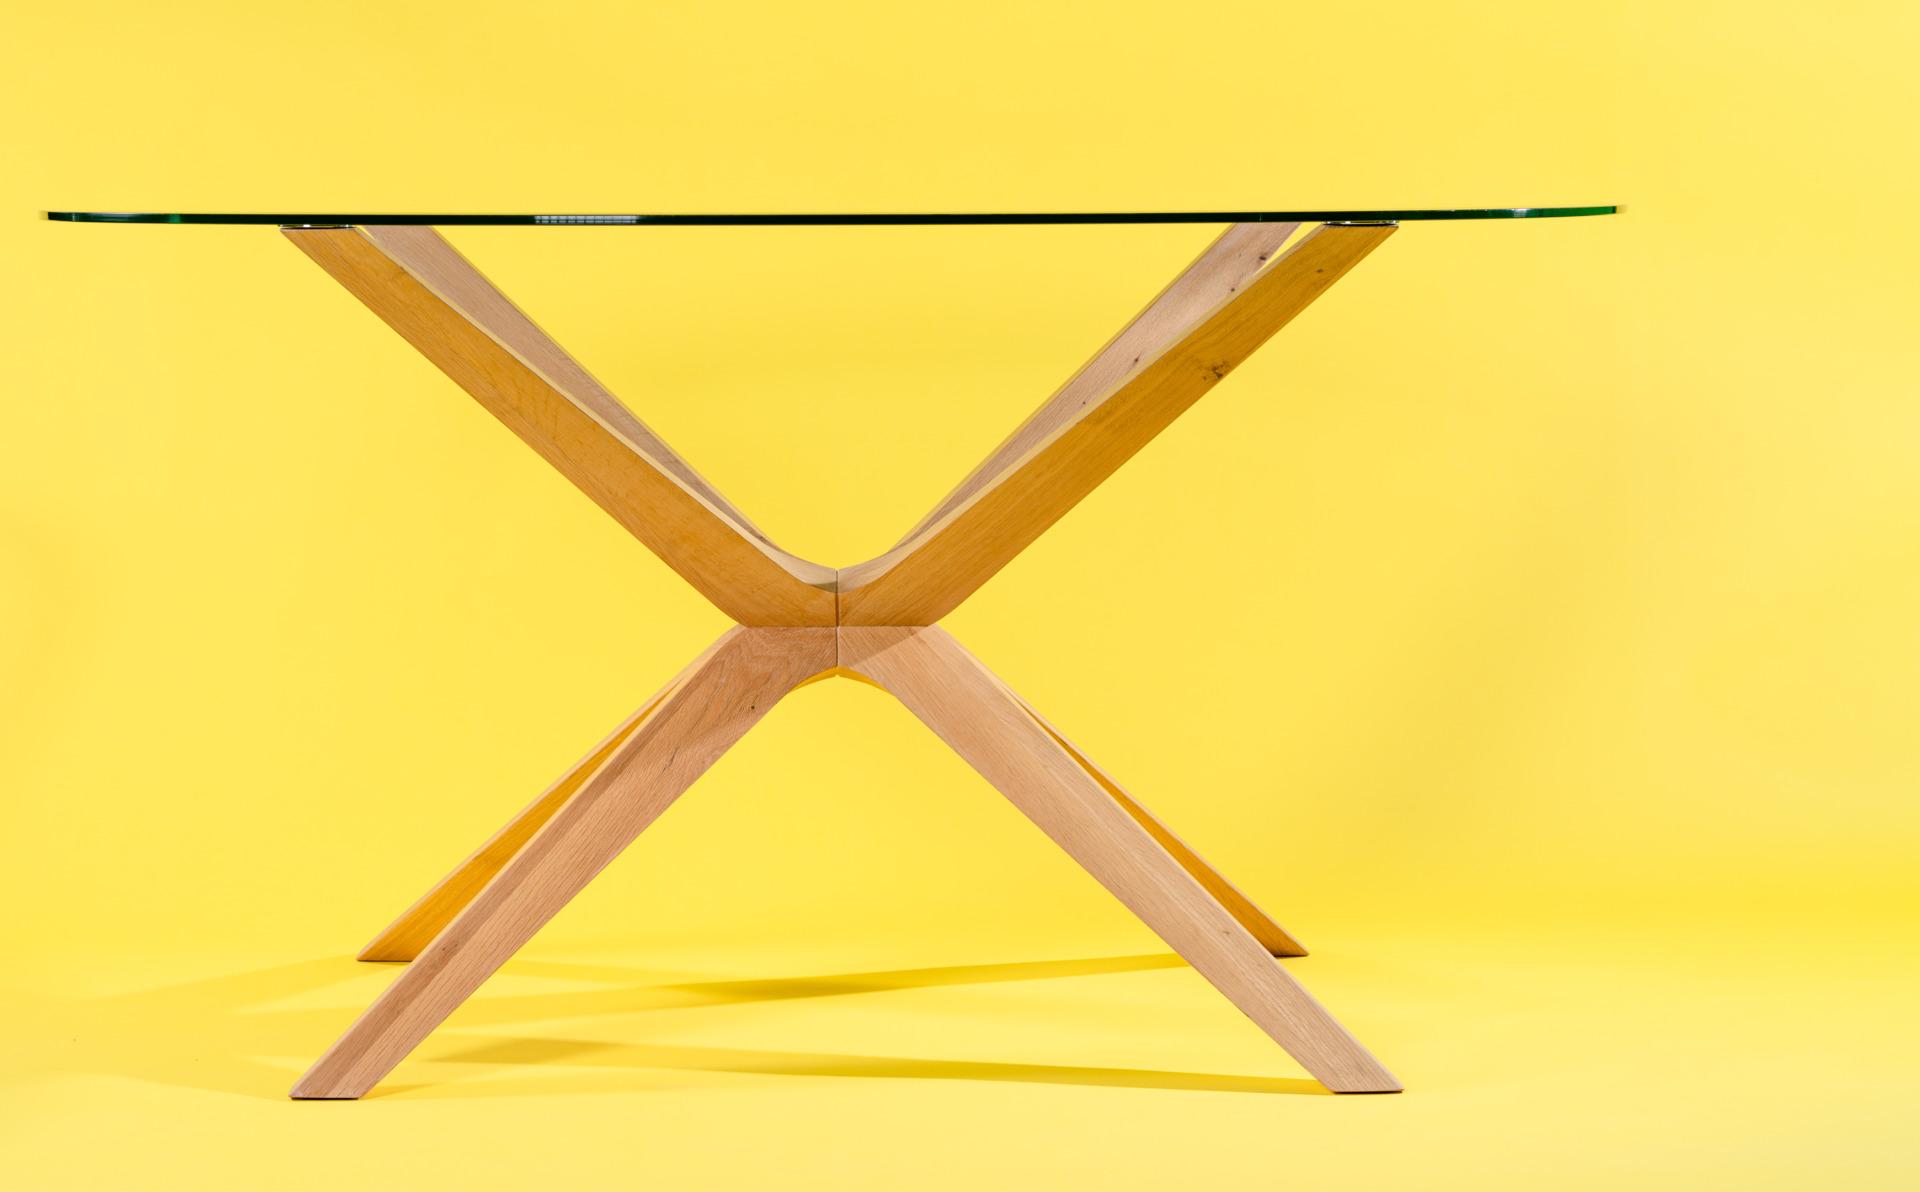 minőségi fabútor, Főoldal